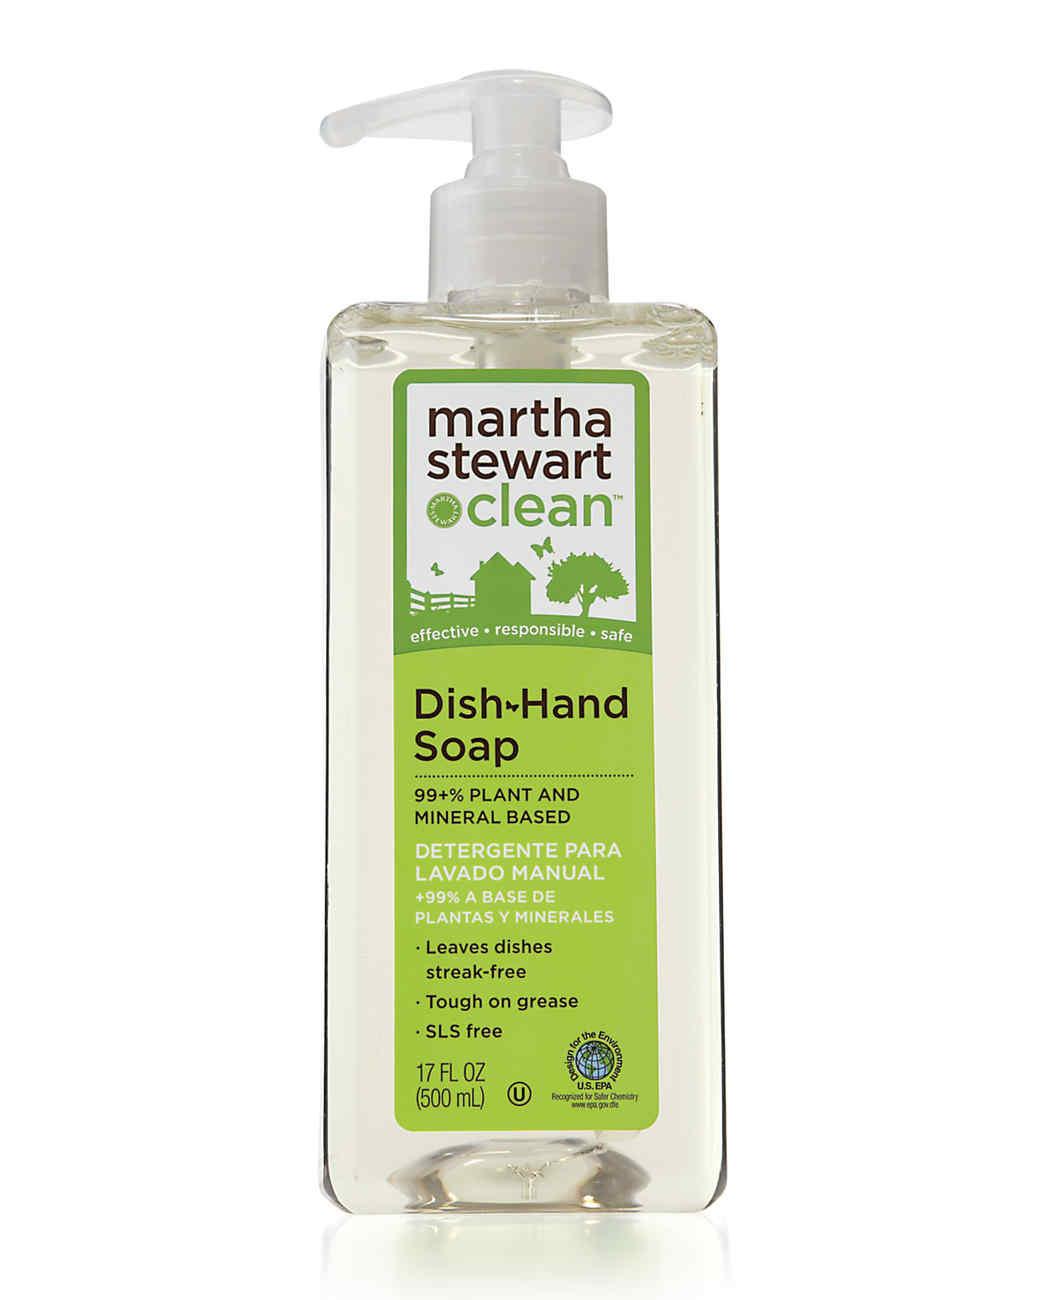 dish-hand-soap-mld108211.jpg